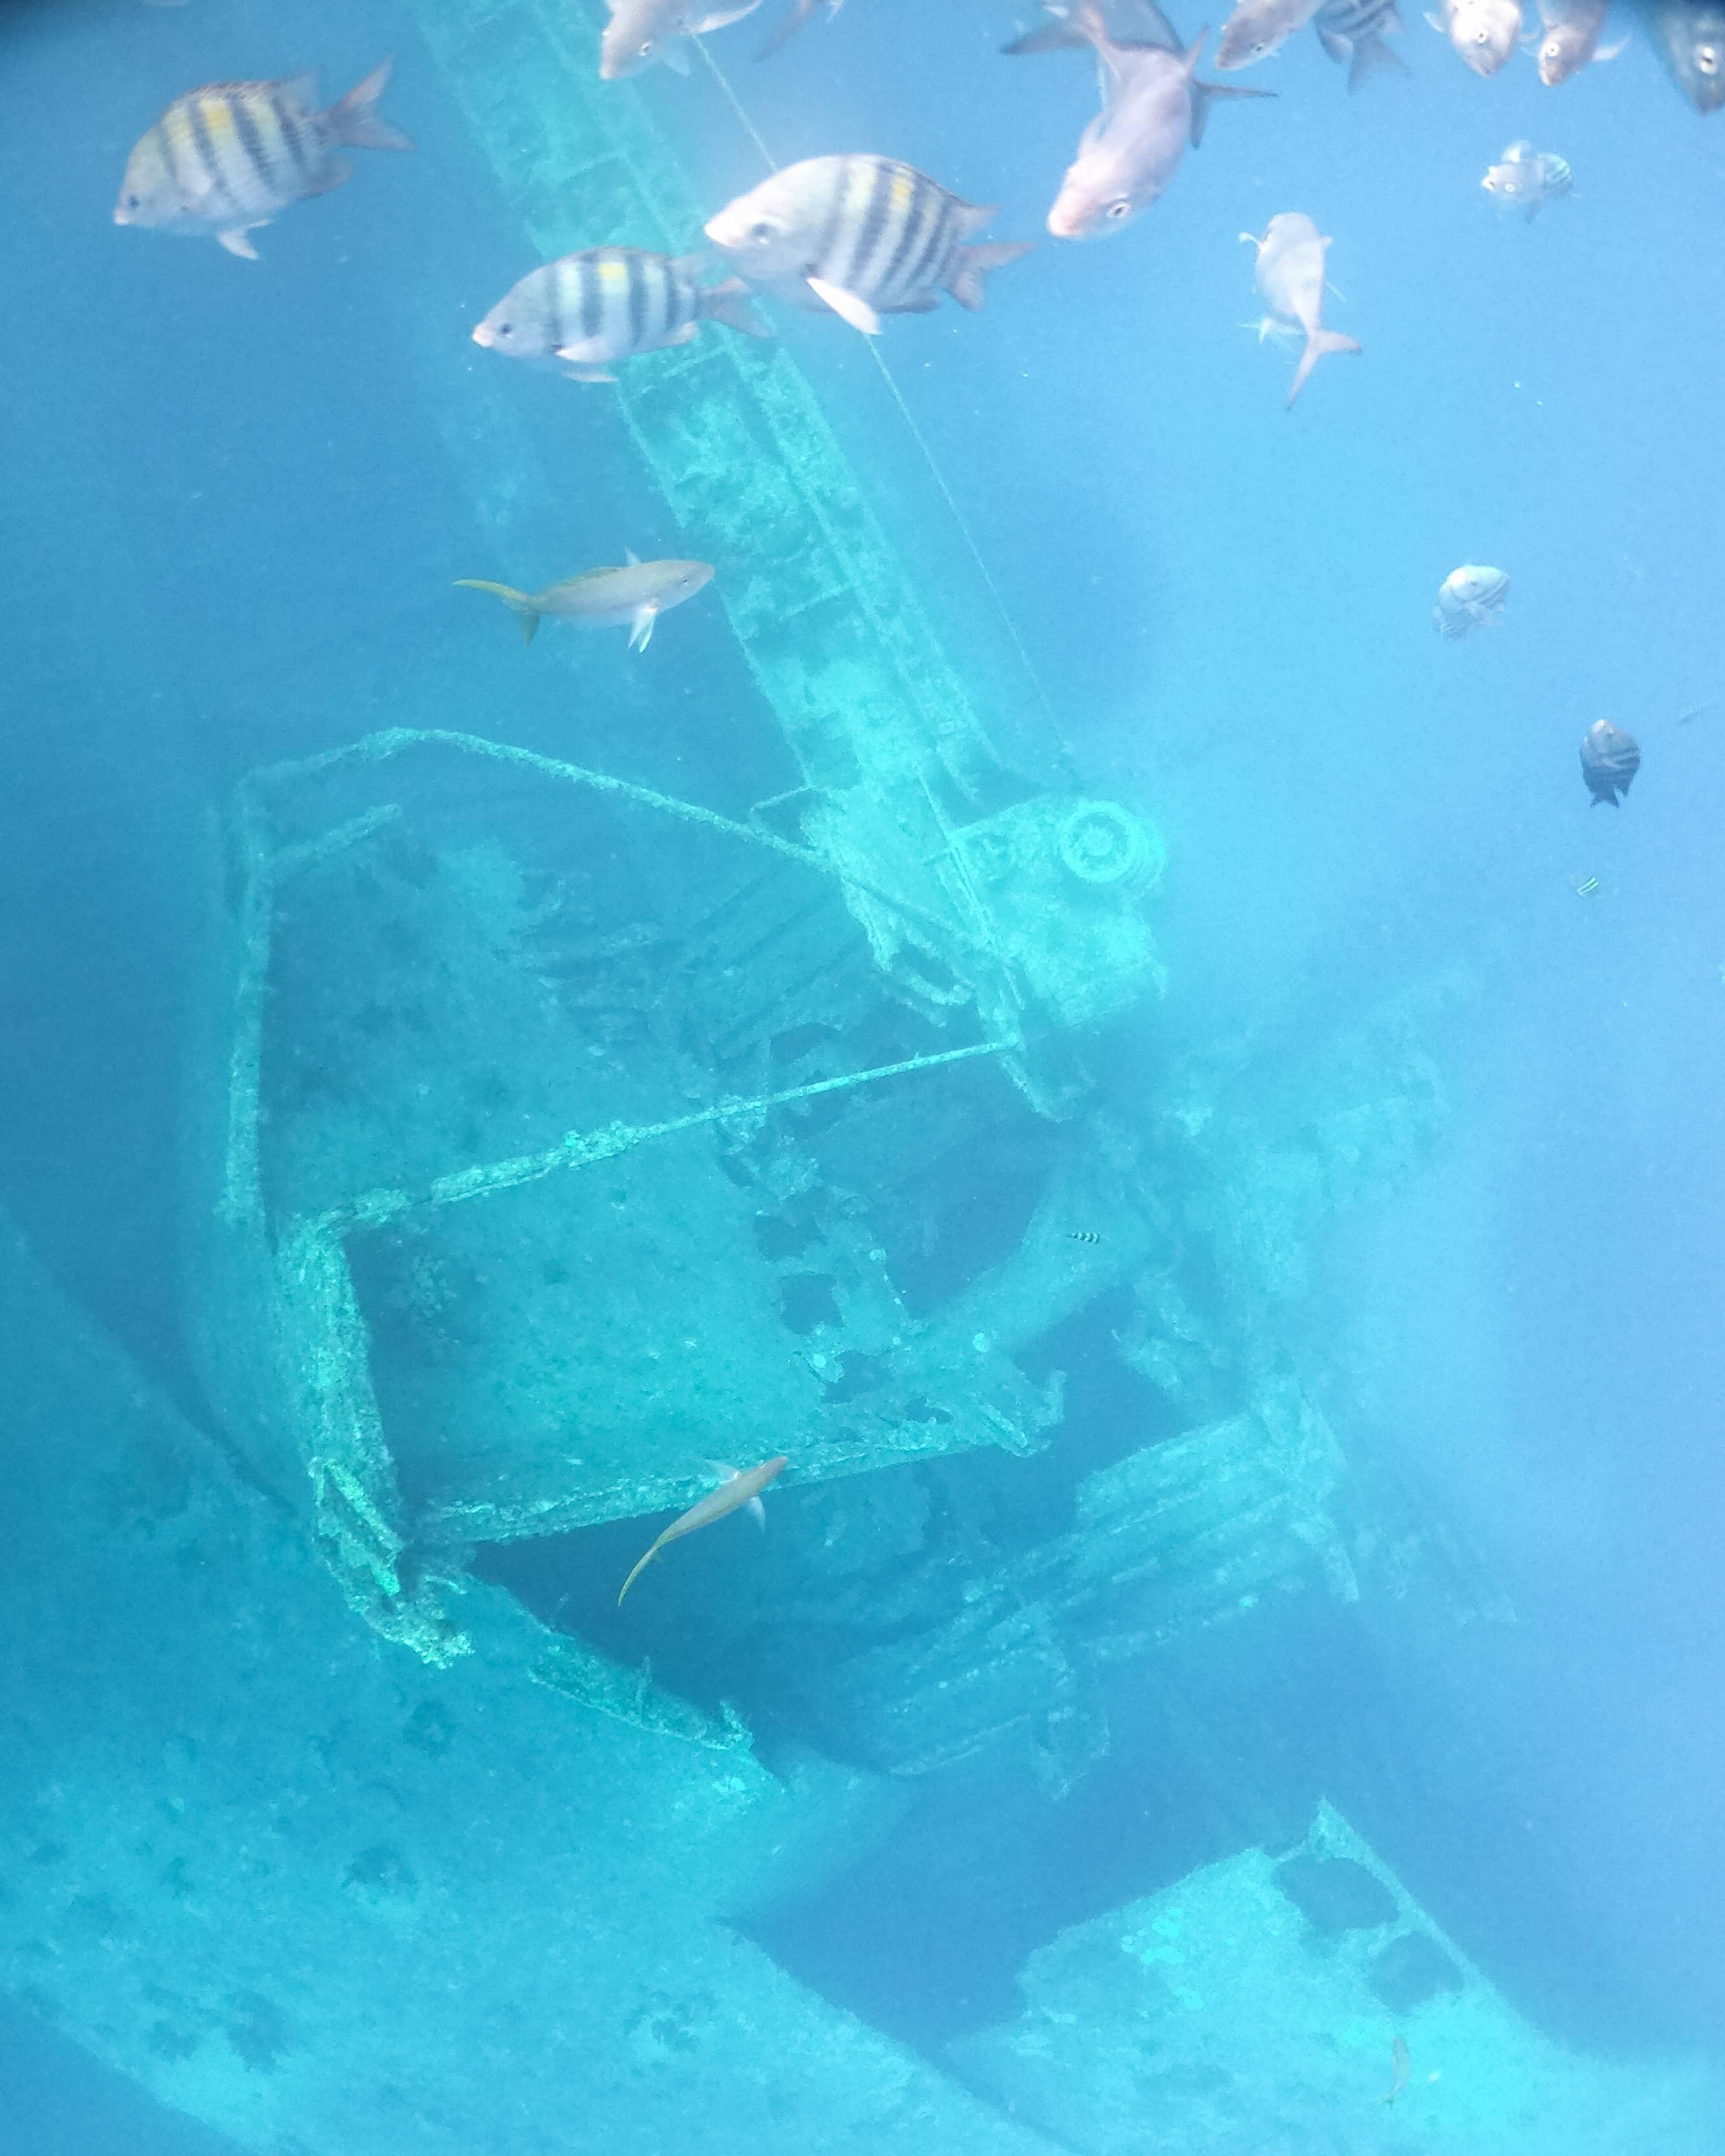 ss antilla shipwreck underwater off the coast of aruba